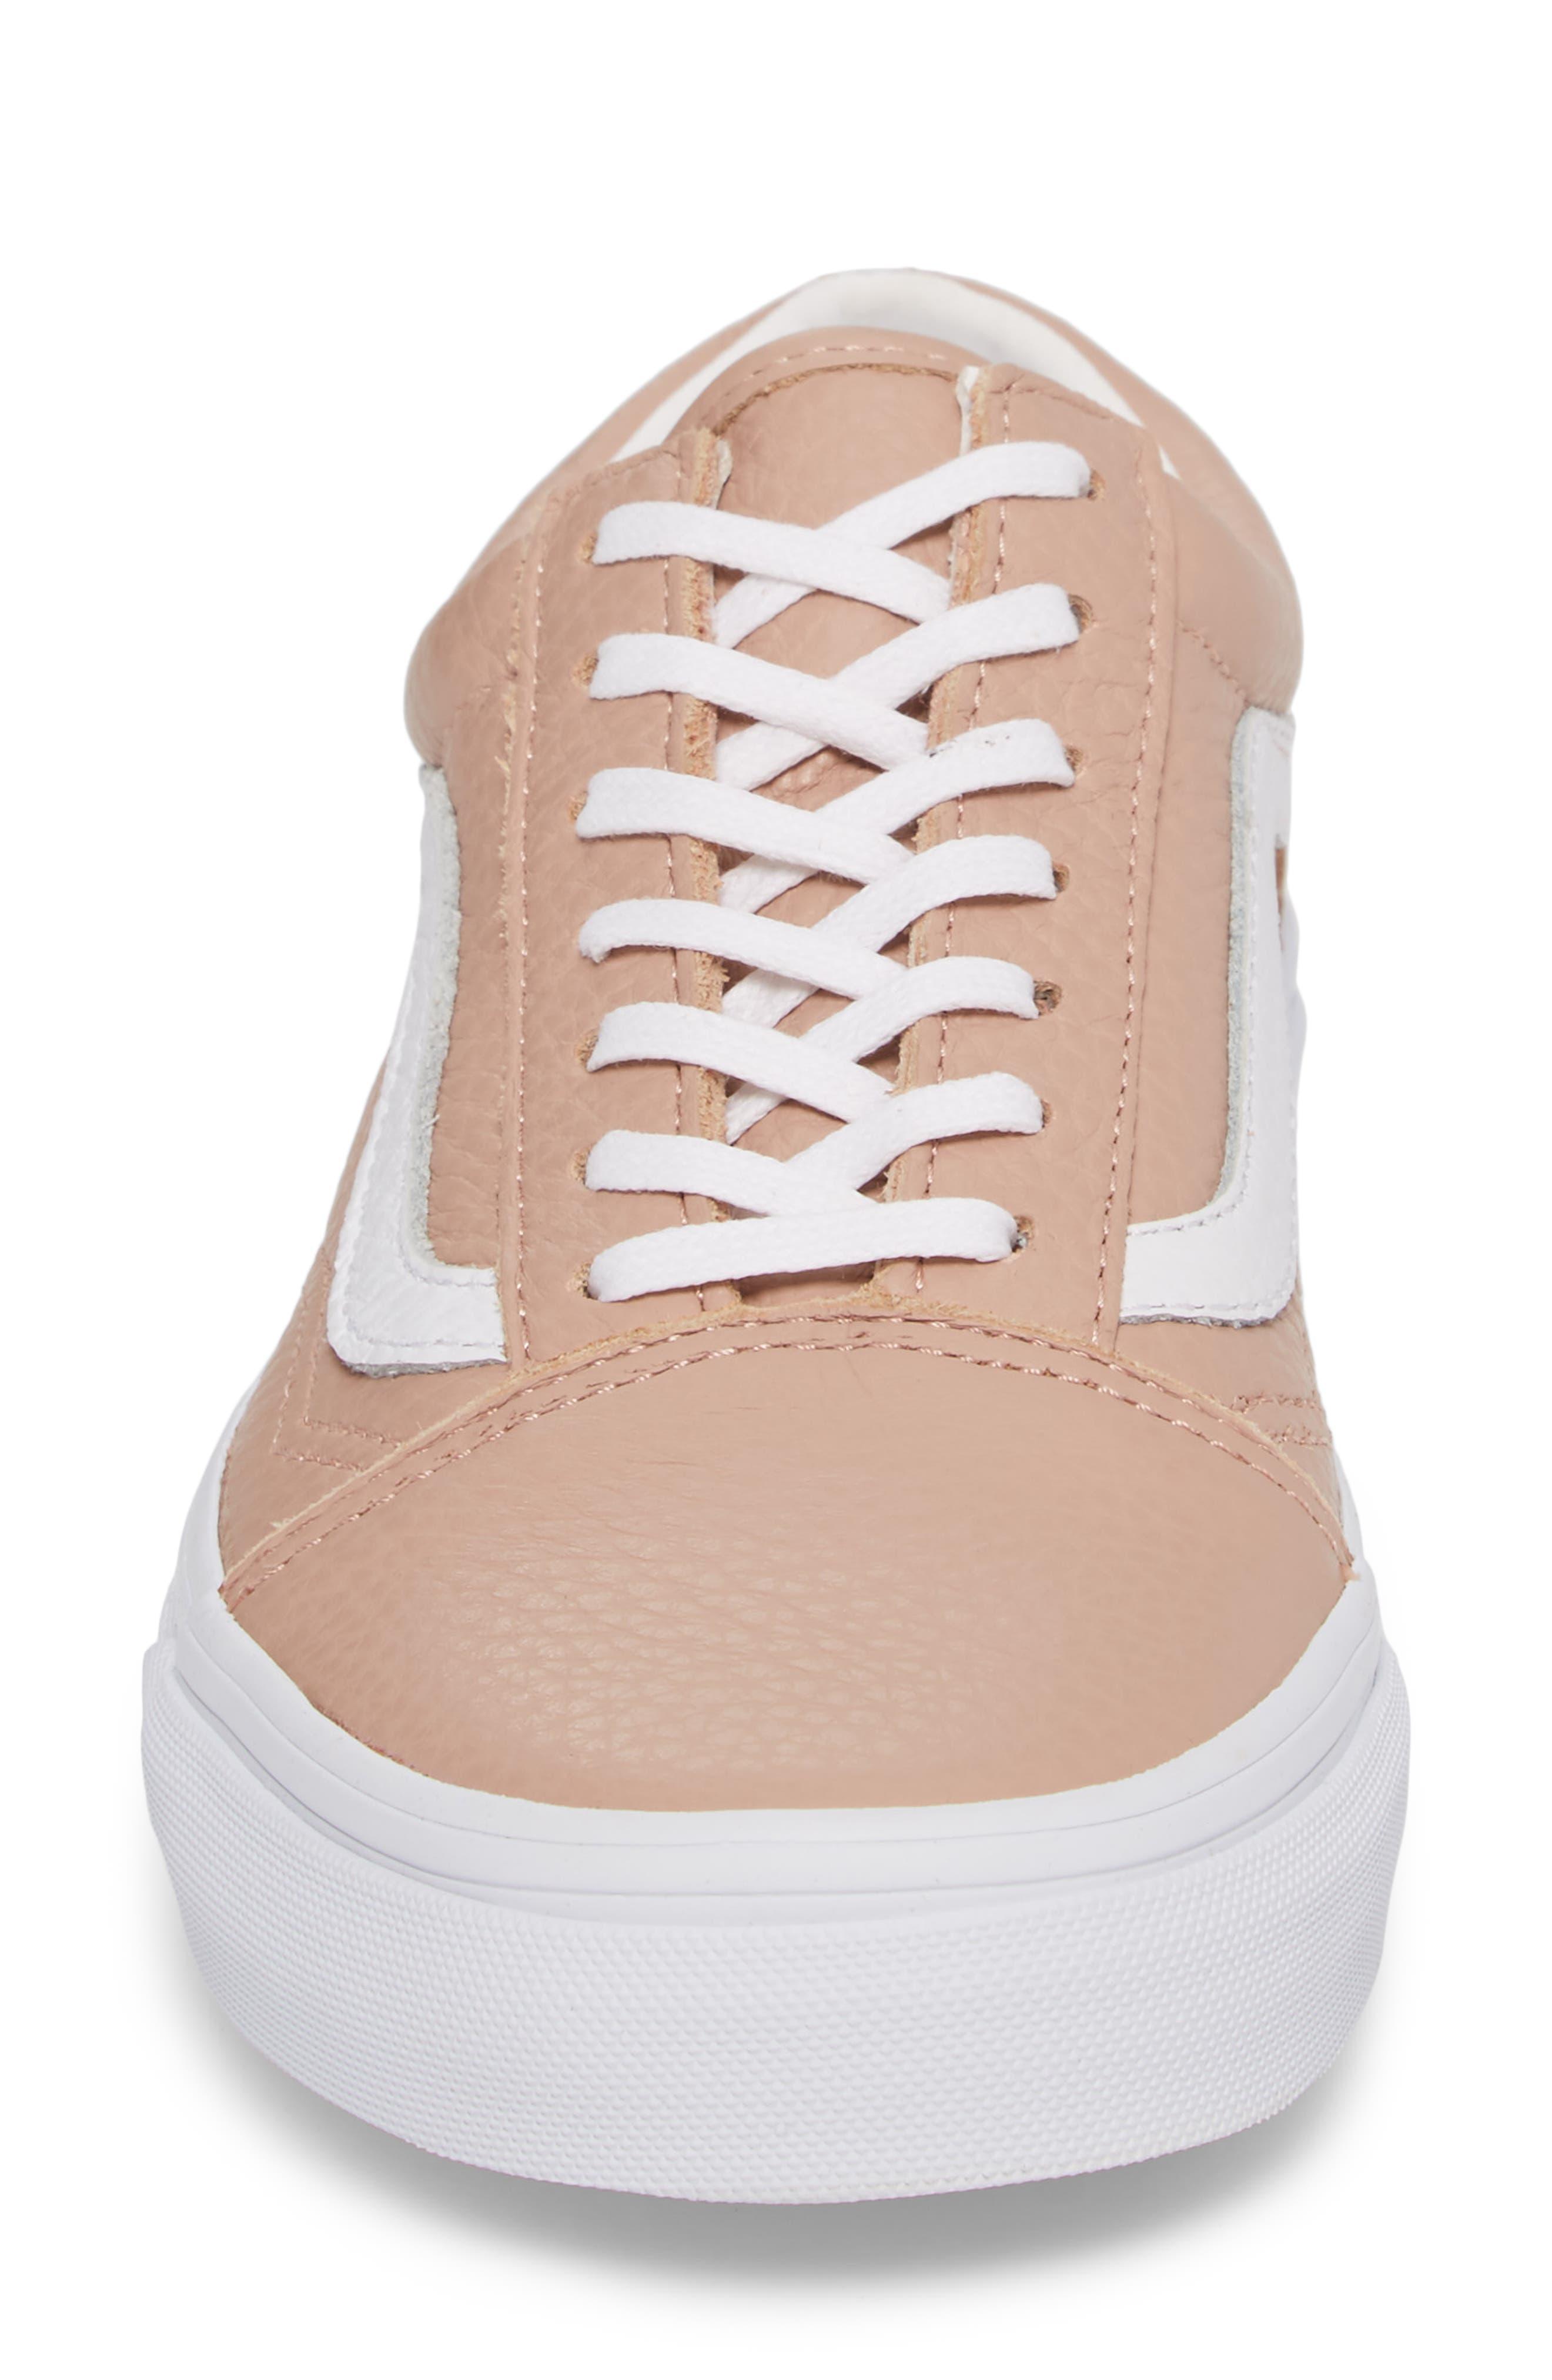 Old Skool DX Sneaker,                             Alternate thumbnail 4, color,                             652